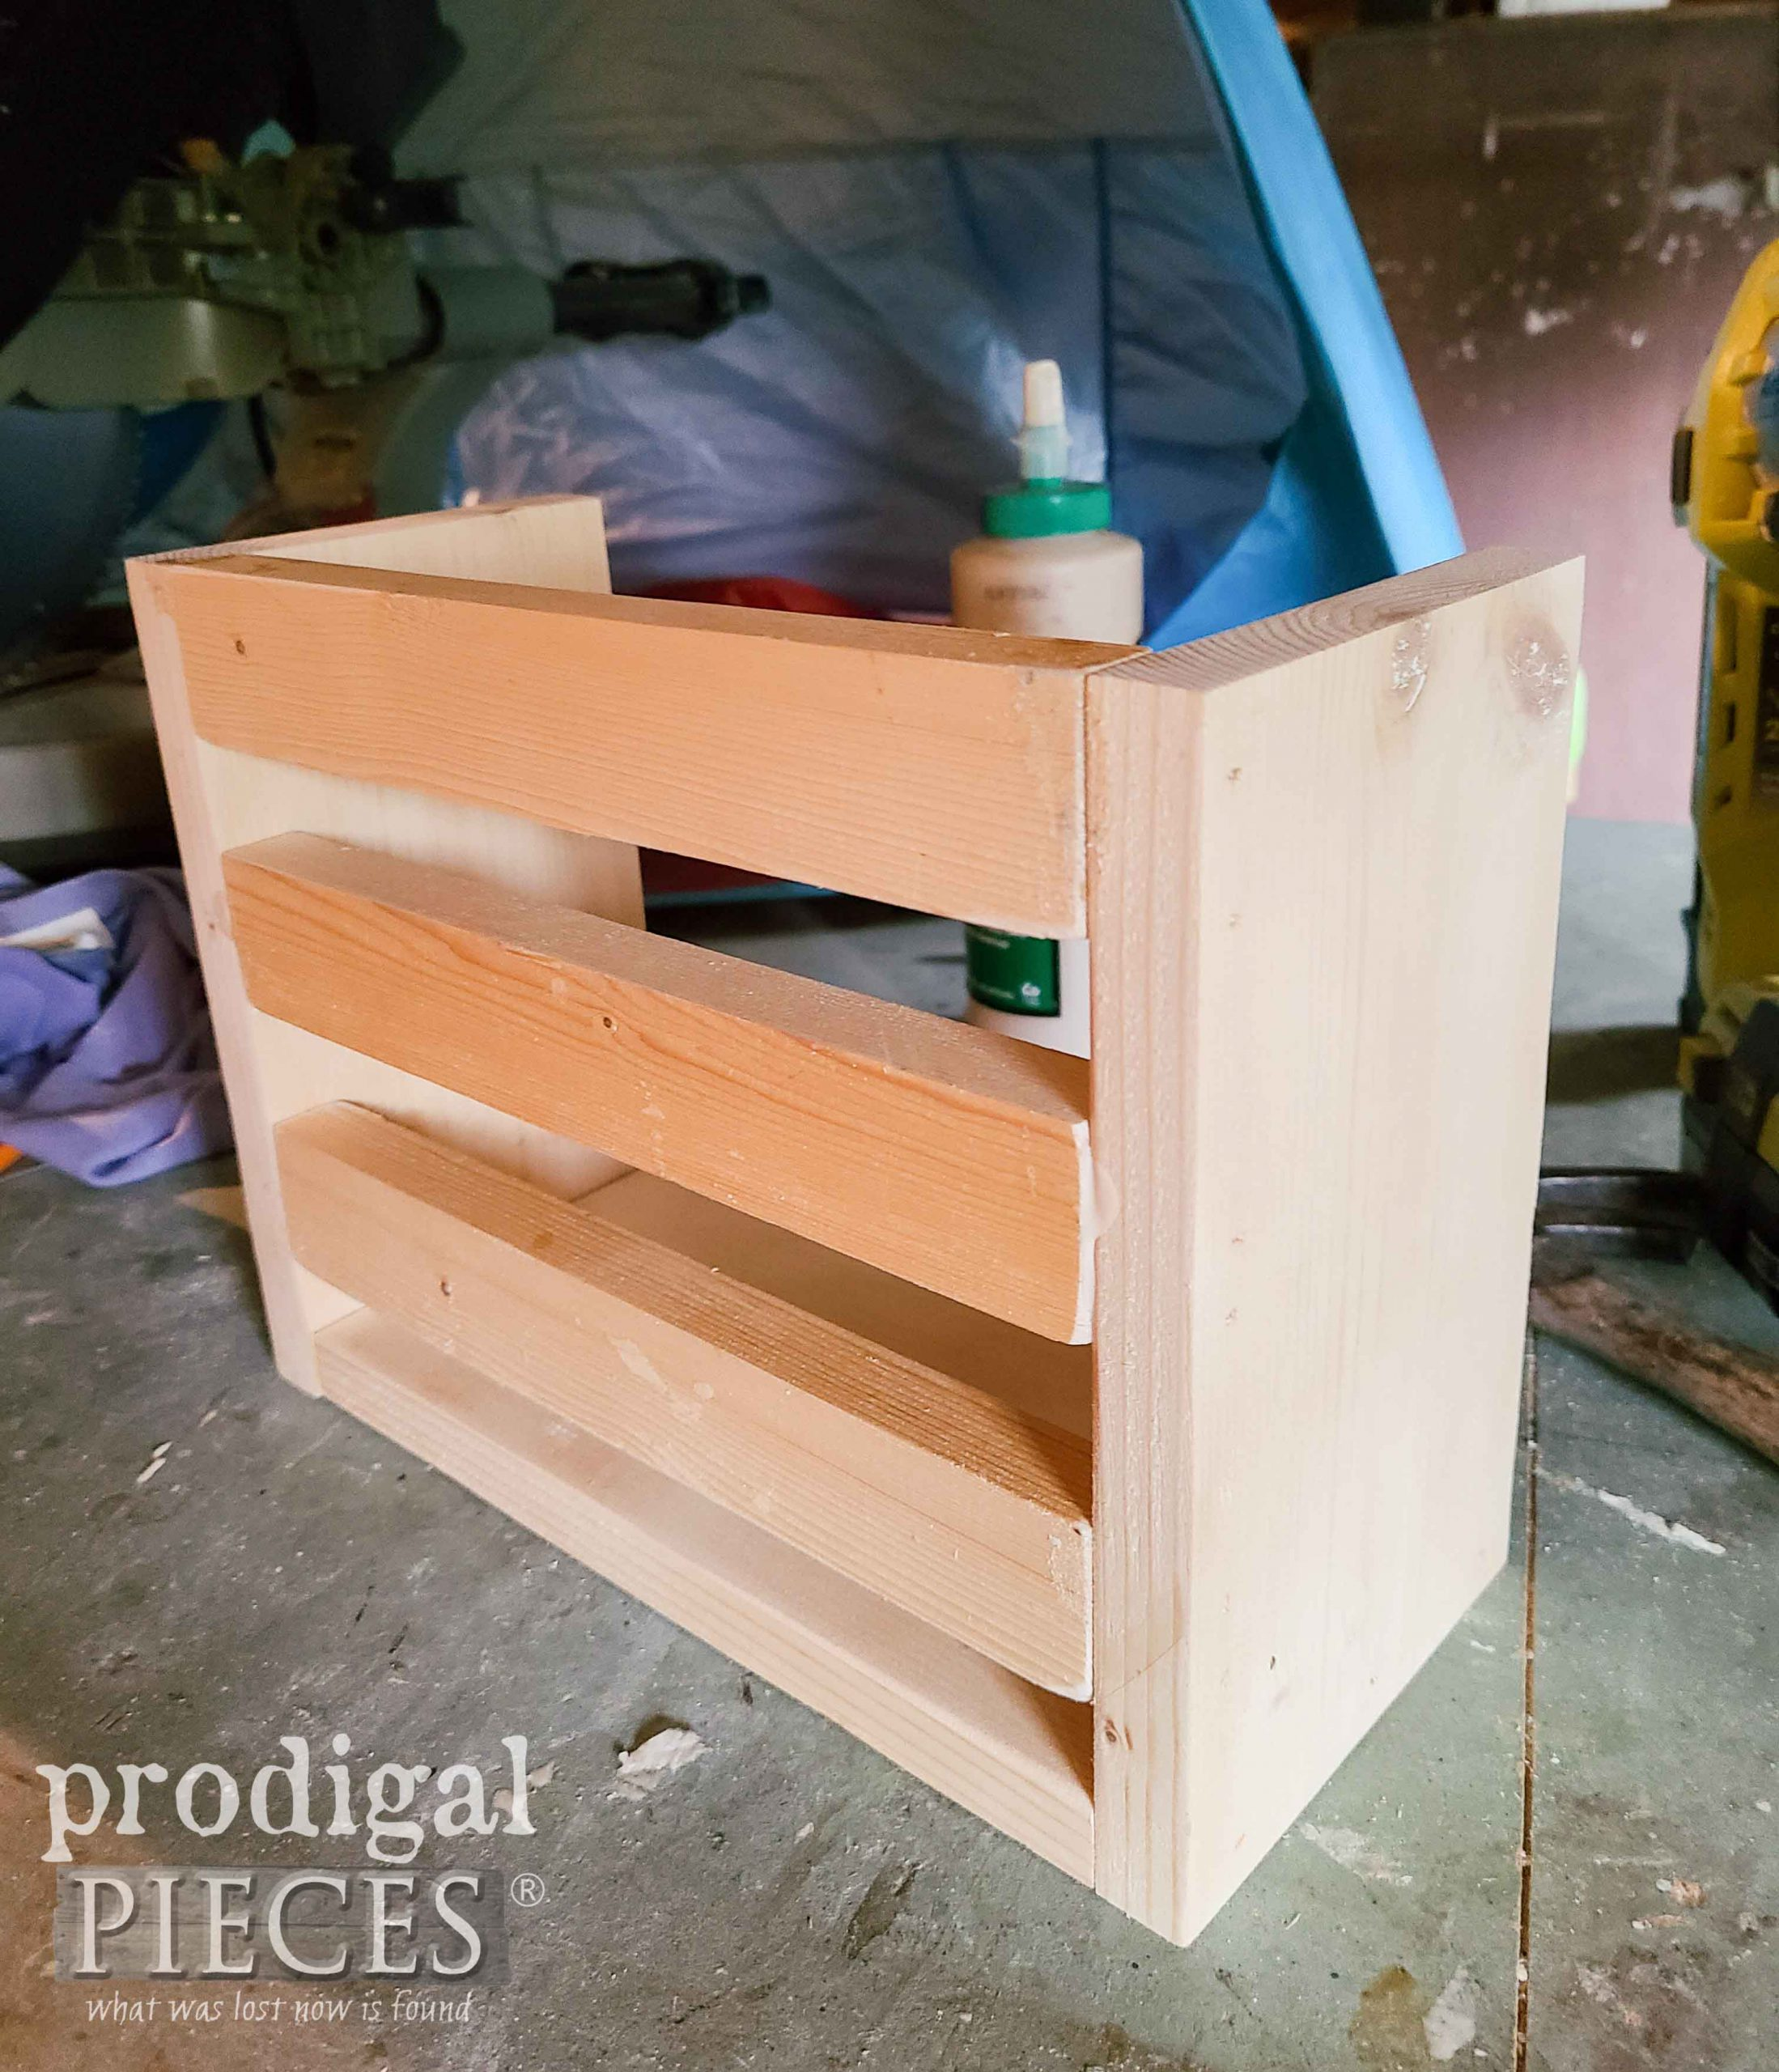 DIY Pine Crate Assembled | prodigalpieces.com